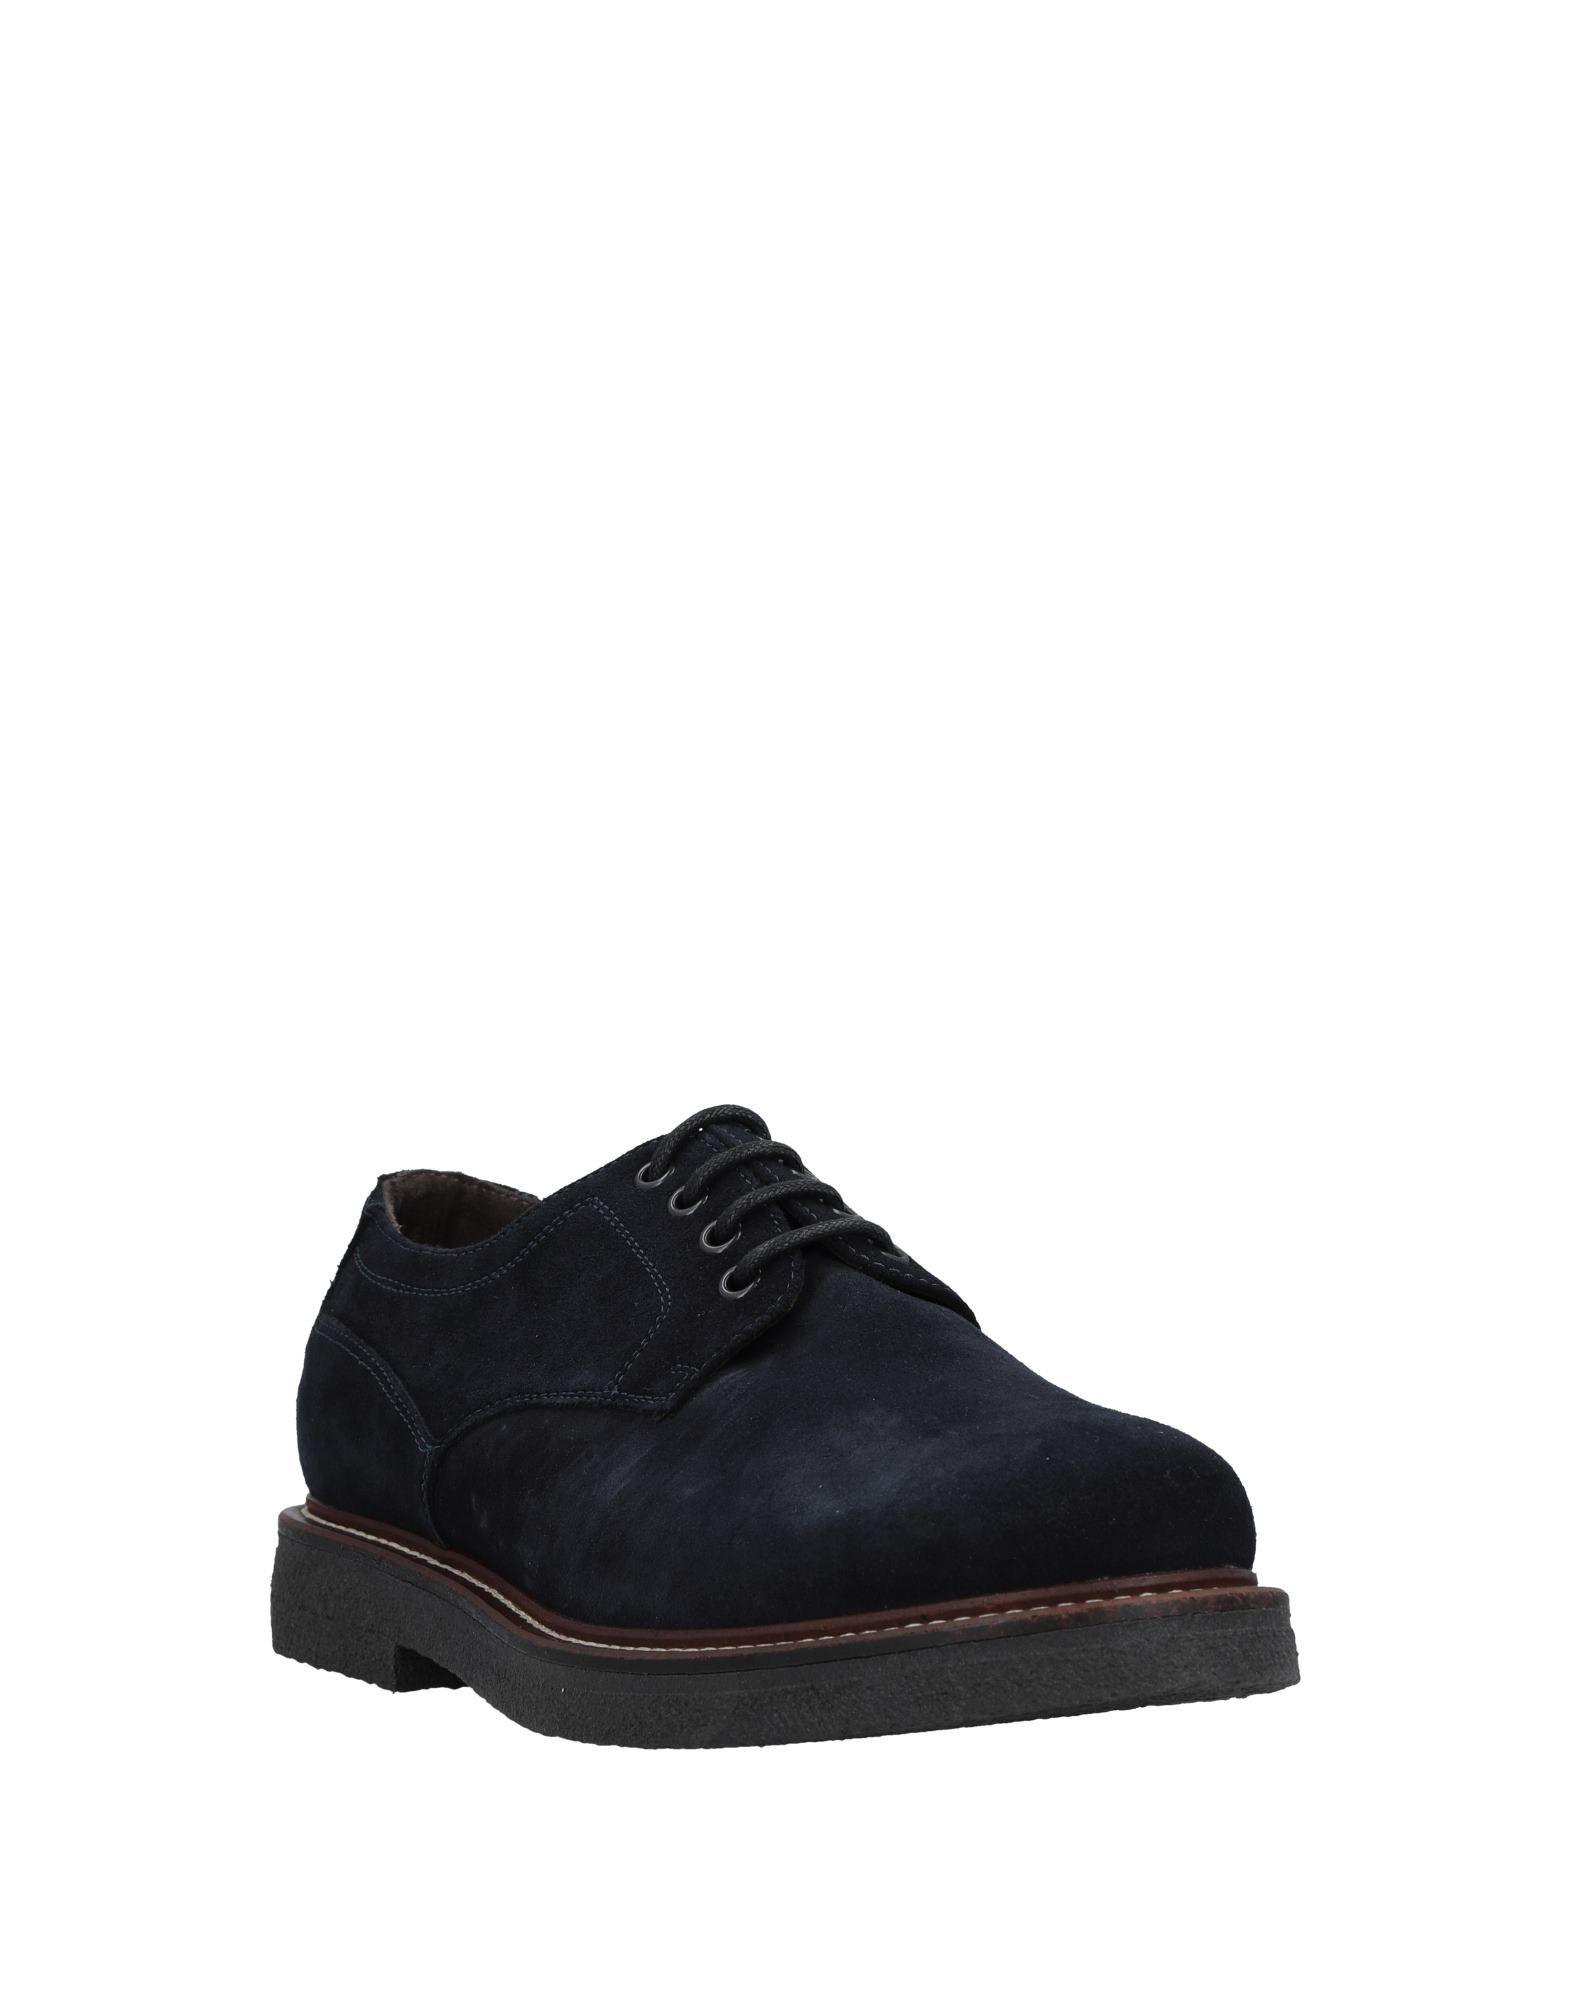 Rabatt Schuhe echte Schuhe Rabatt Anderson Schnürschuhe Herren 11521692MC 653d75